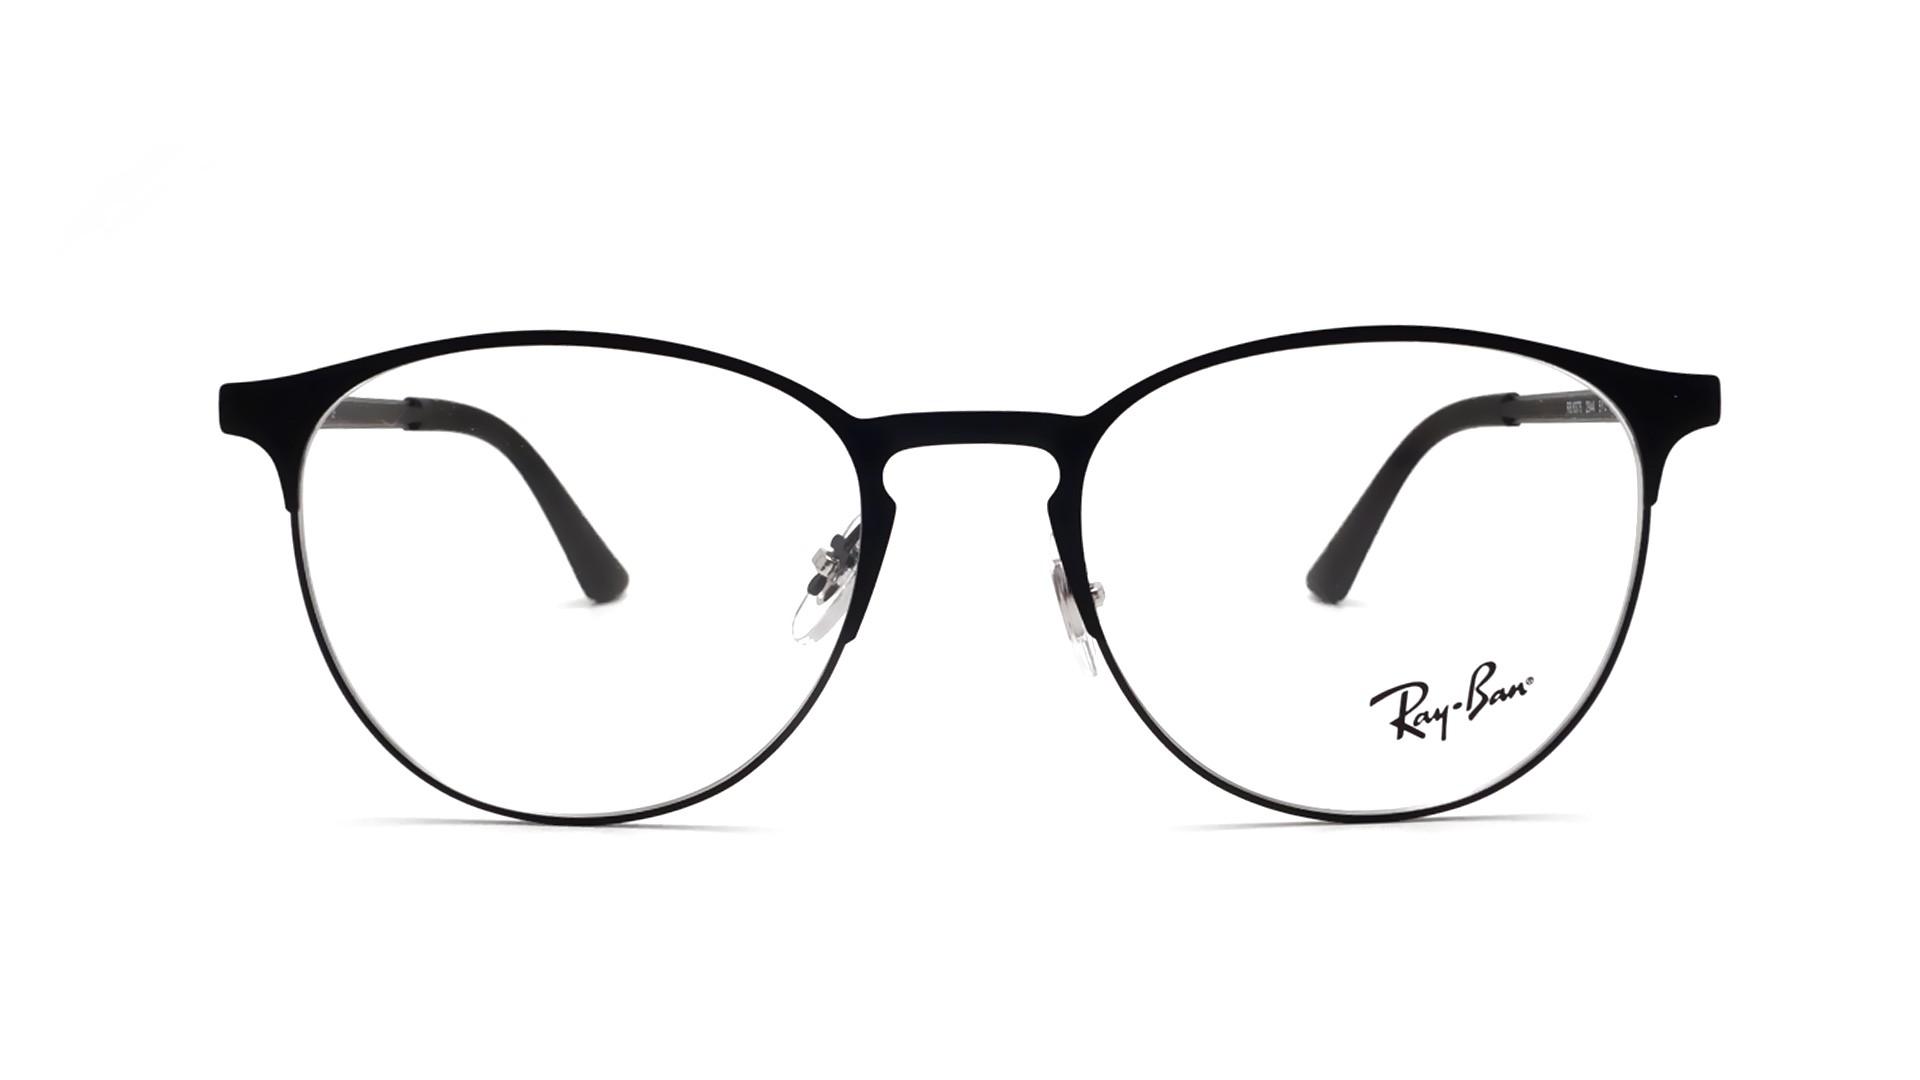 Ray Ban Rx6375 Rb6375 2944 51 18 Black Mat Visiofactory